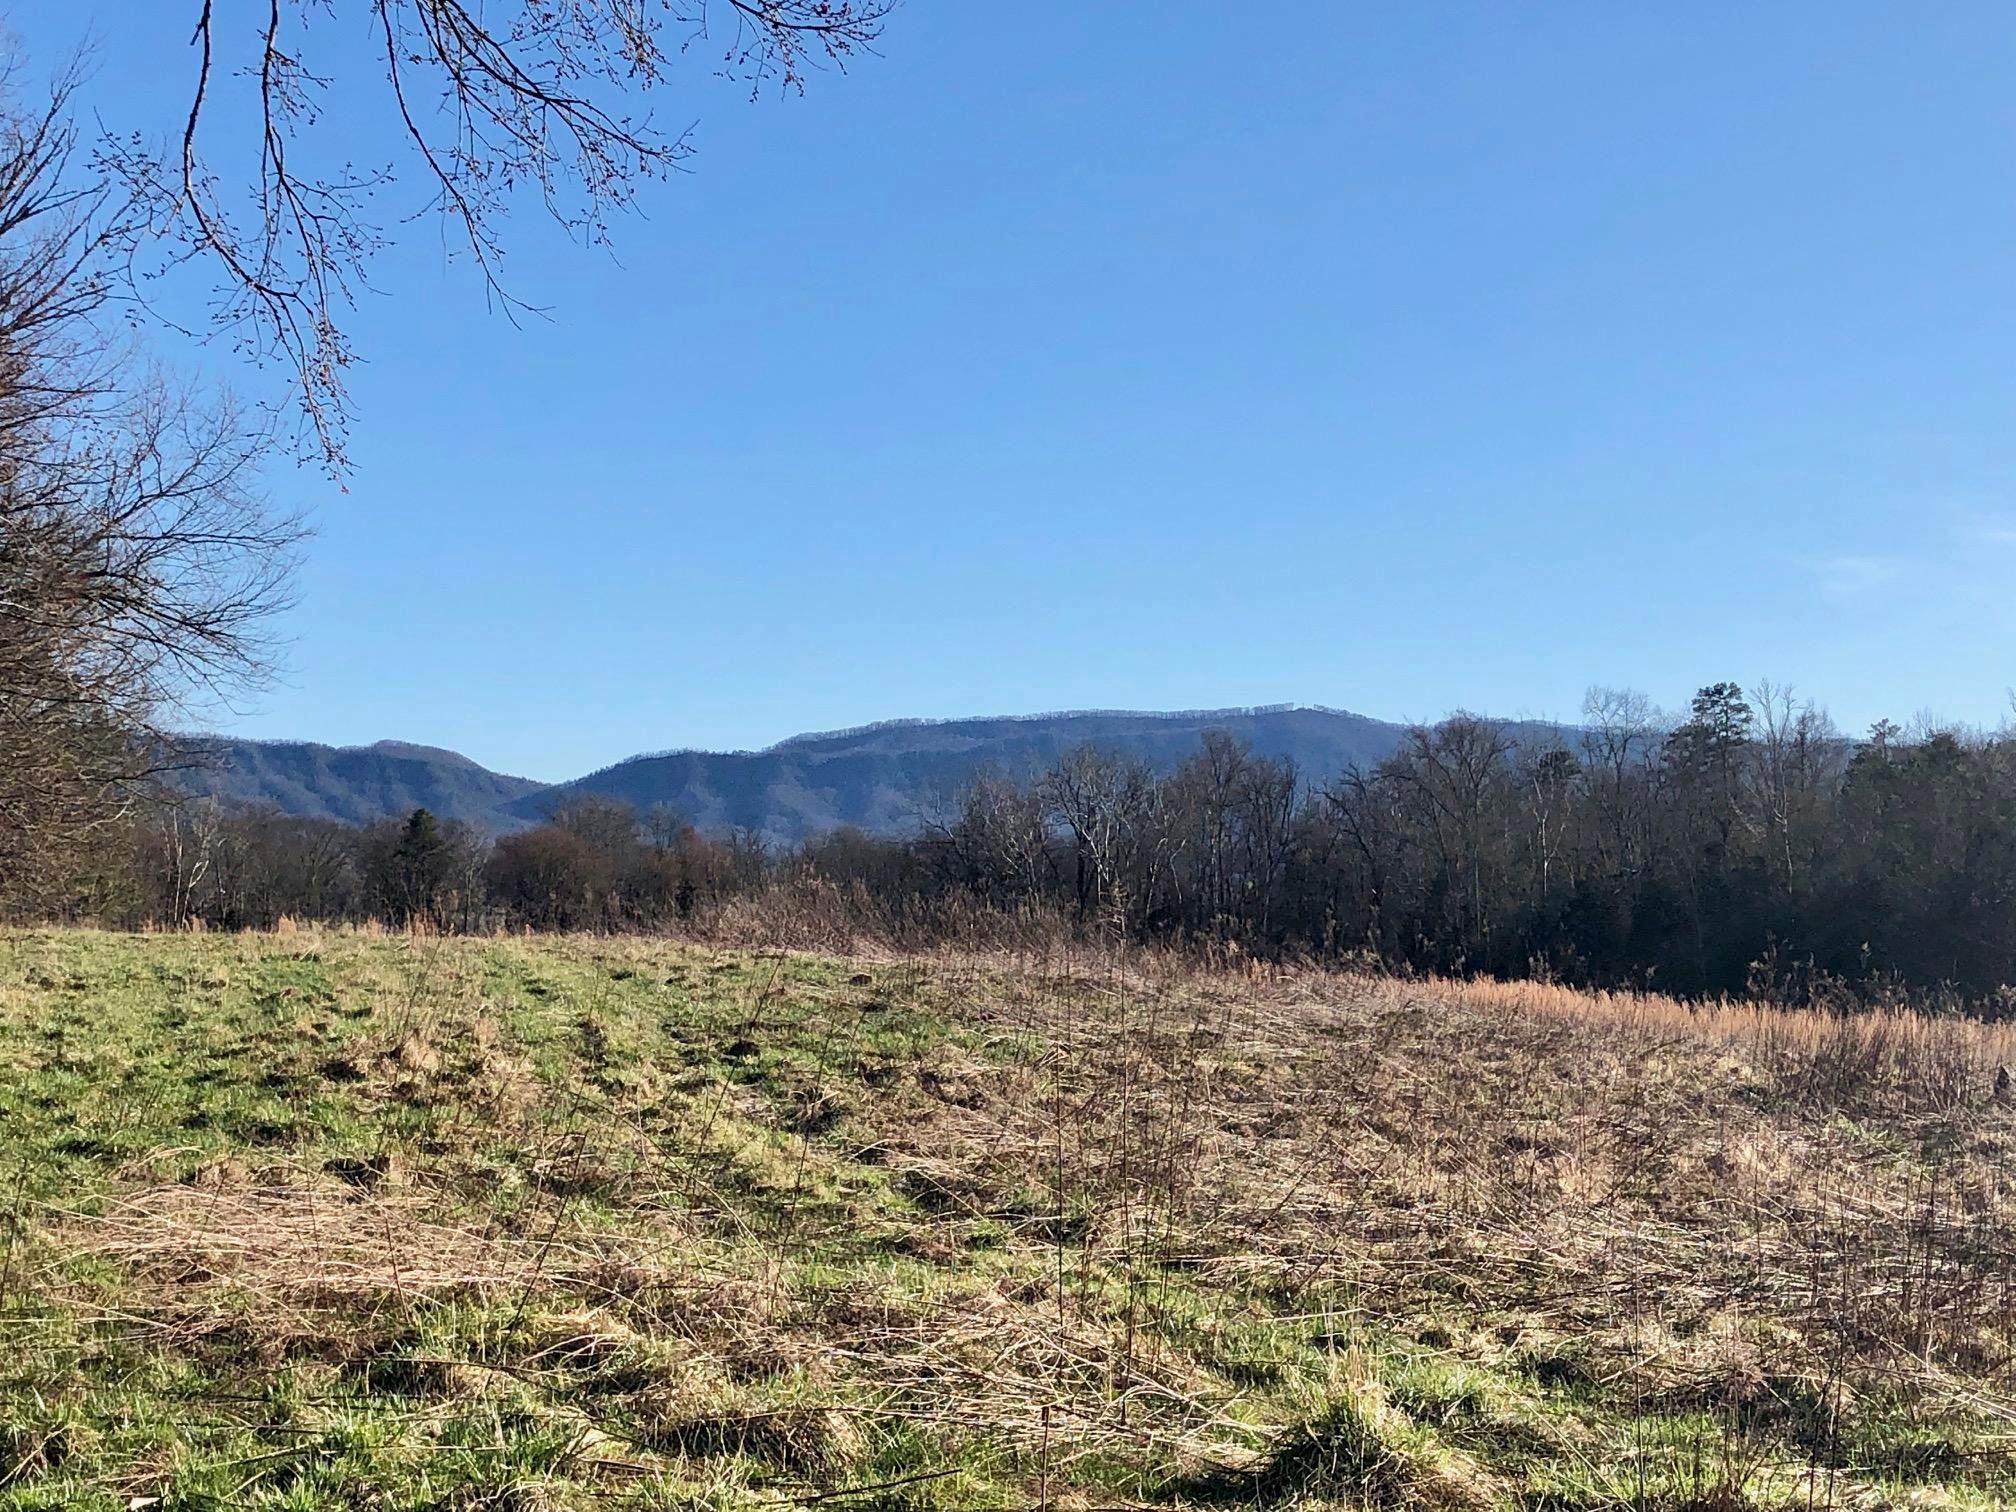 Wye Dr, Seymour, TN 37865 - Lot/Land - MLS #1069738 - 11 Photos | Trulia